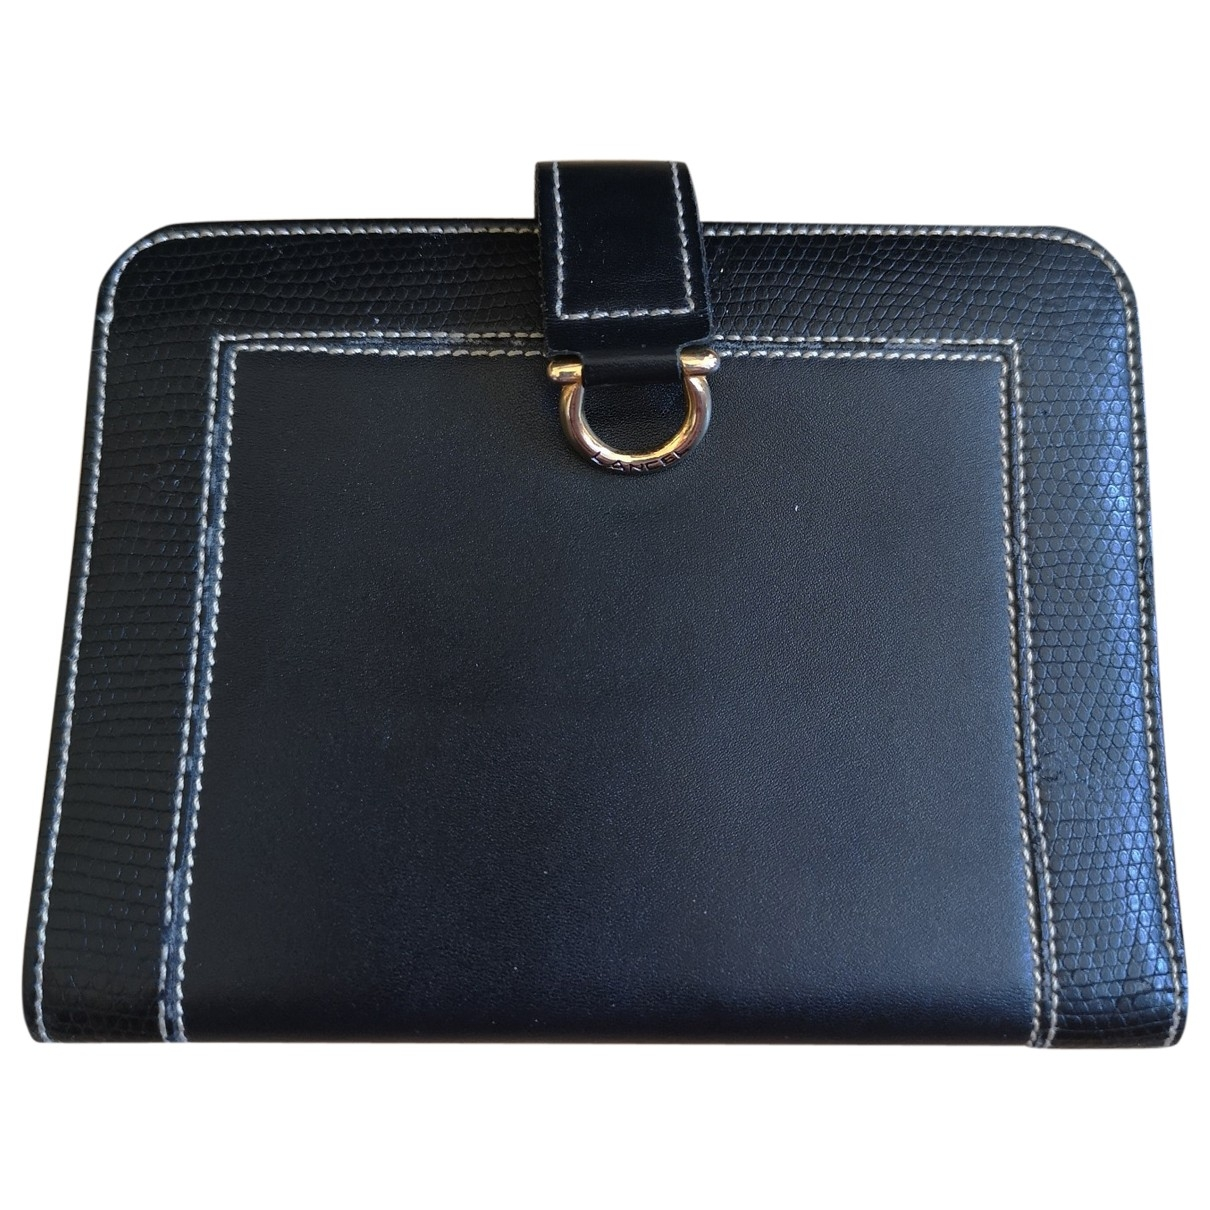 Lancel \N Black Leather wallet for Women \N